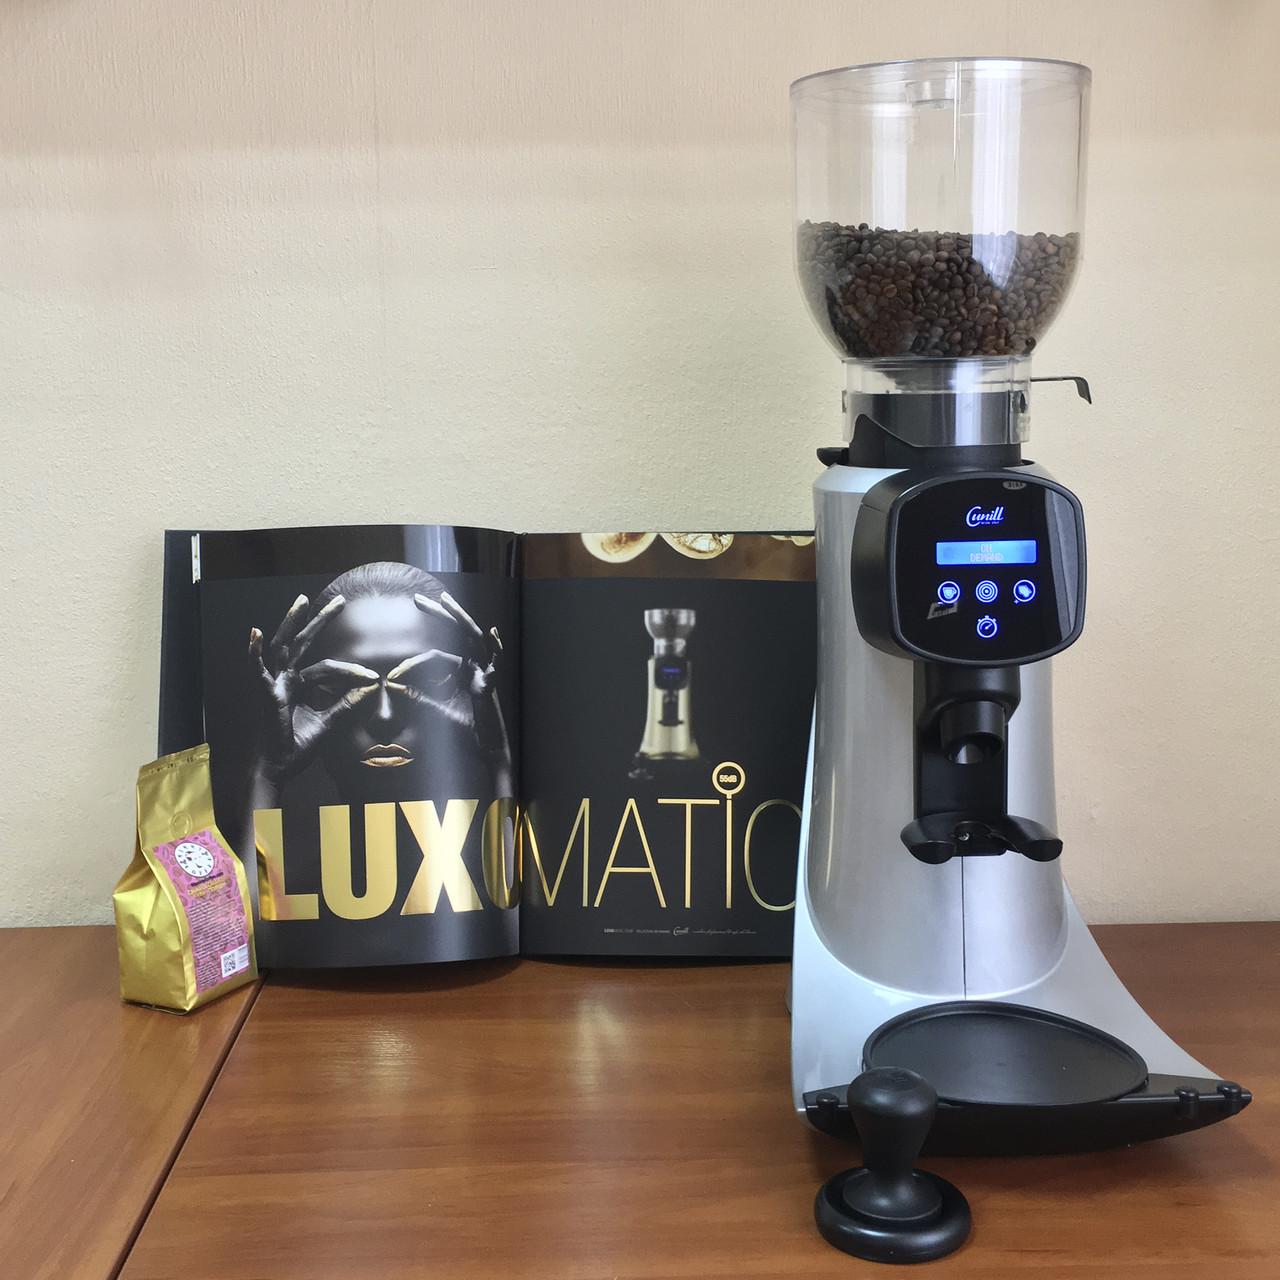 Кофемолка Cunill LUXOMATIC 500W 55dB aluminium grey